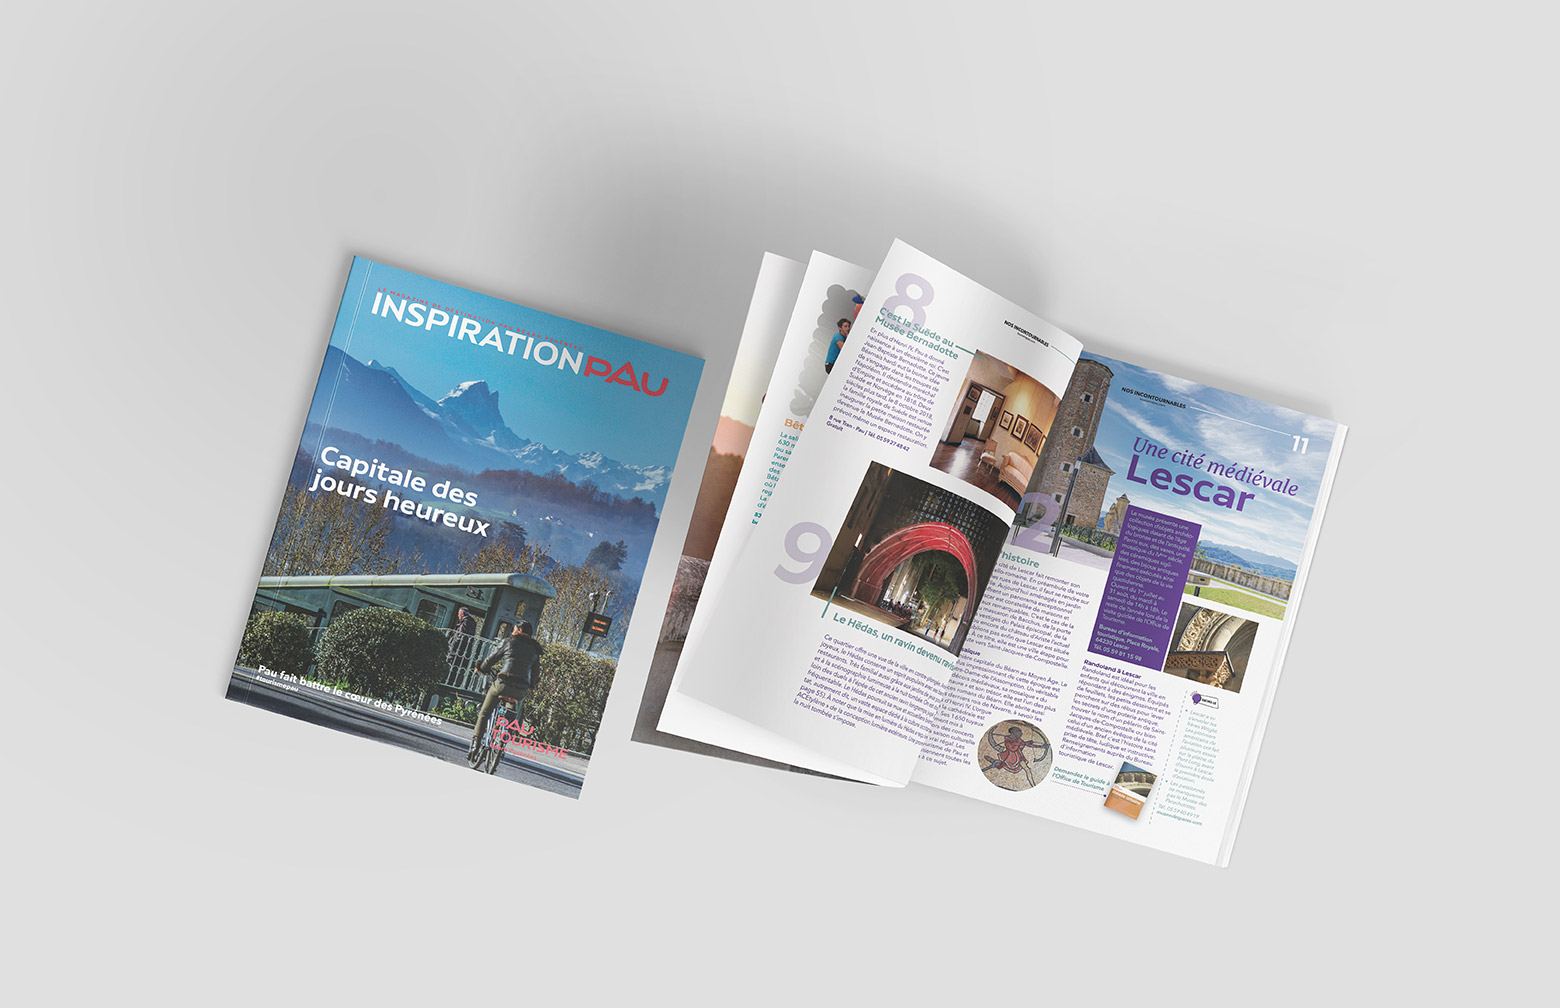 Magazine Inspiration Pau